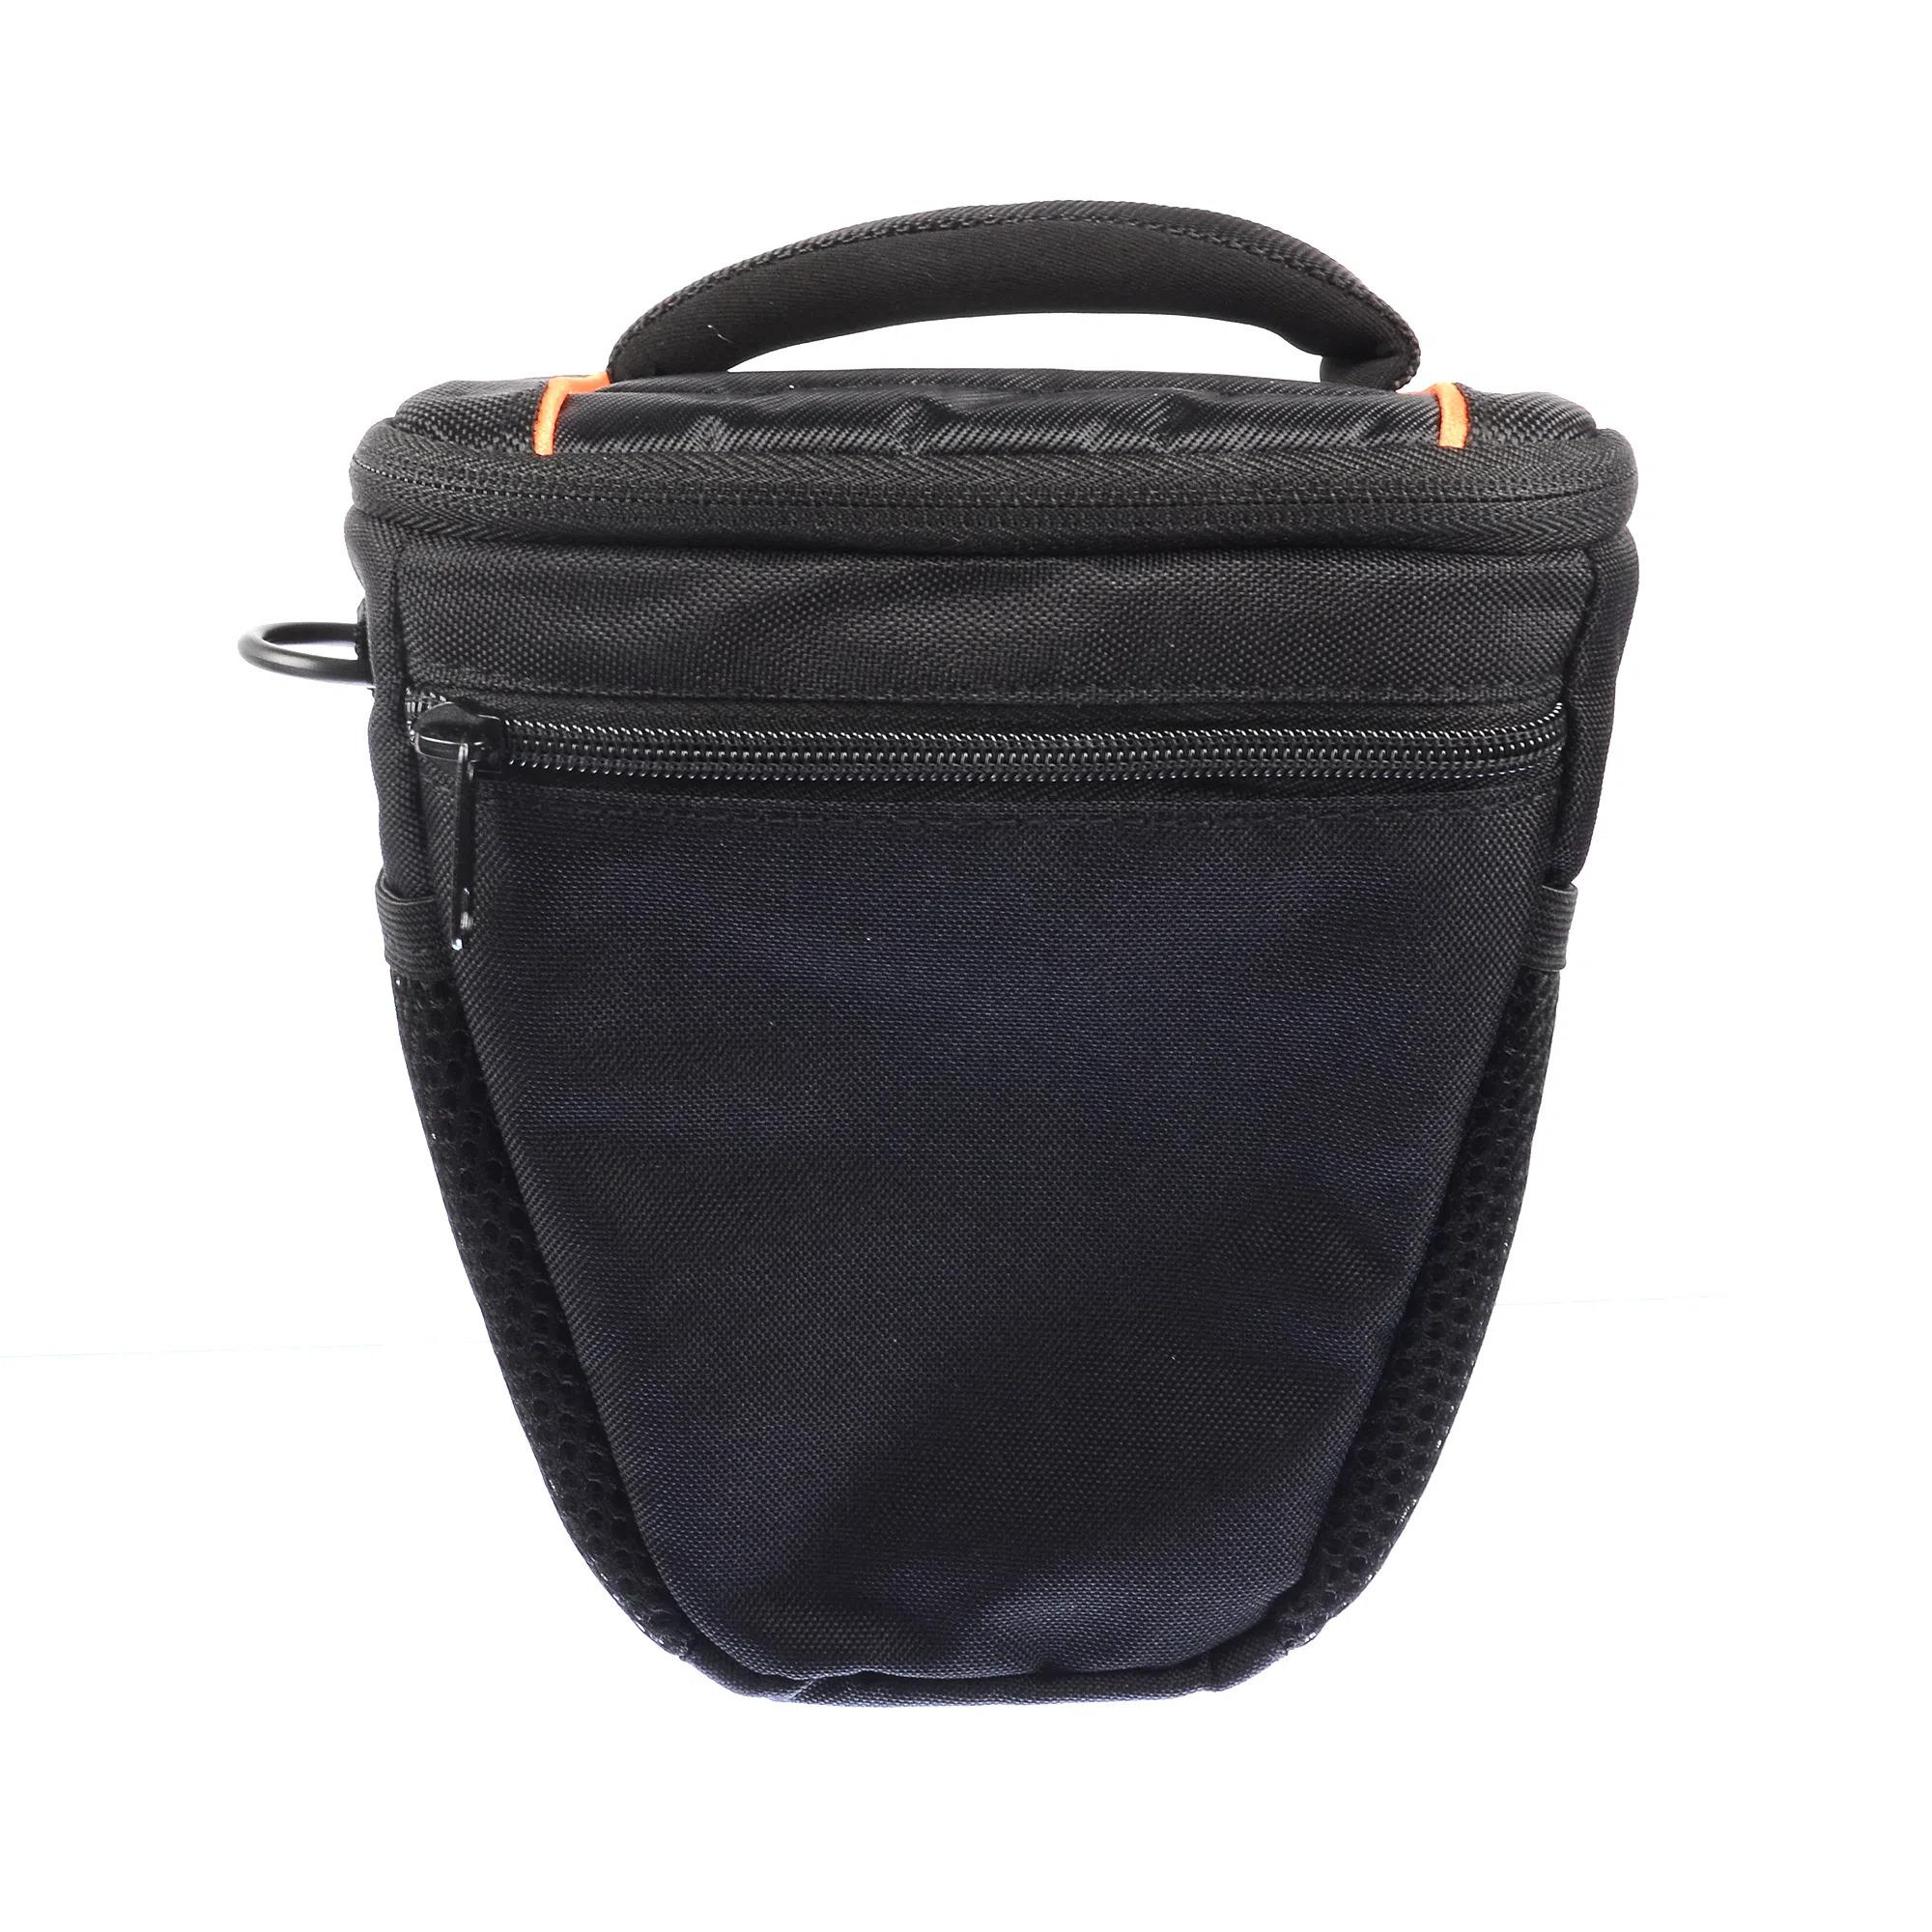 FANCIER Alpha 20 Tricorn Bag